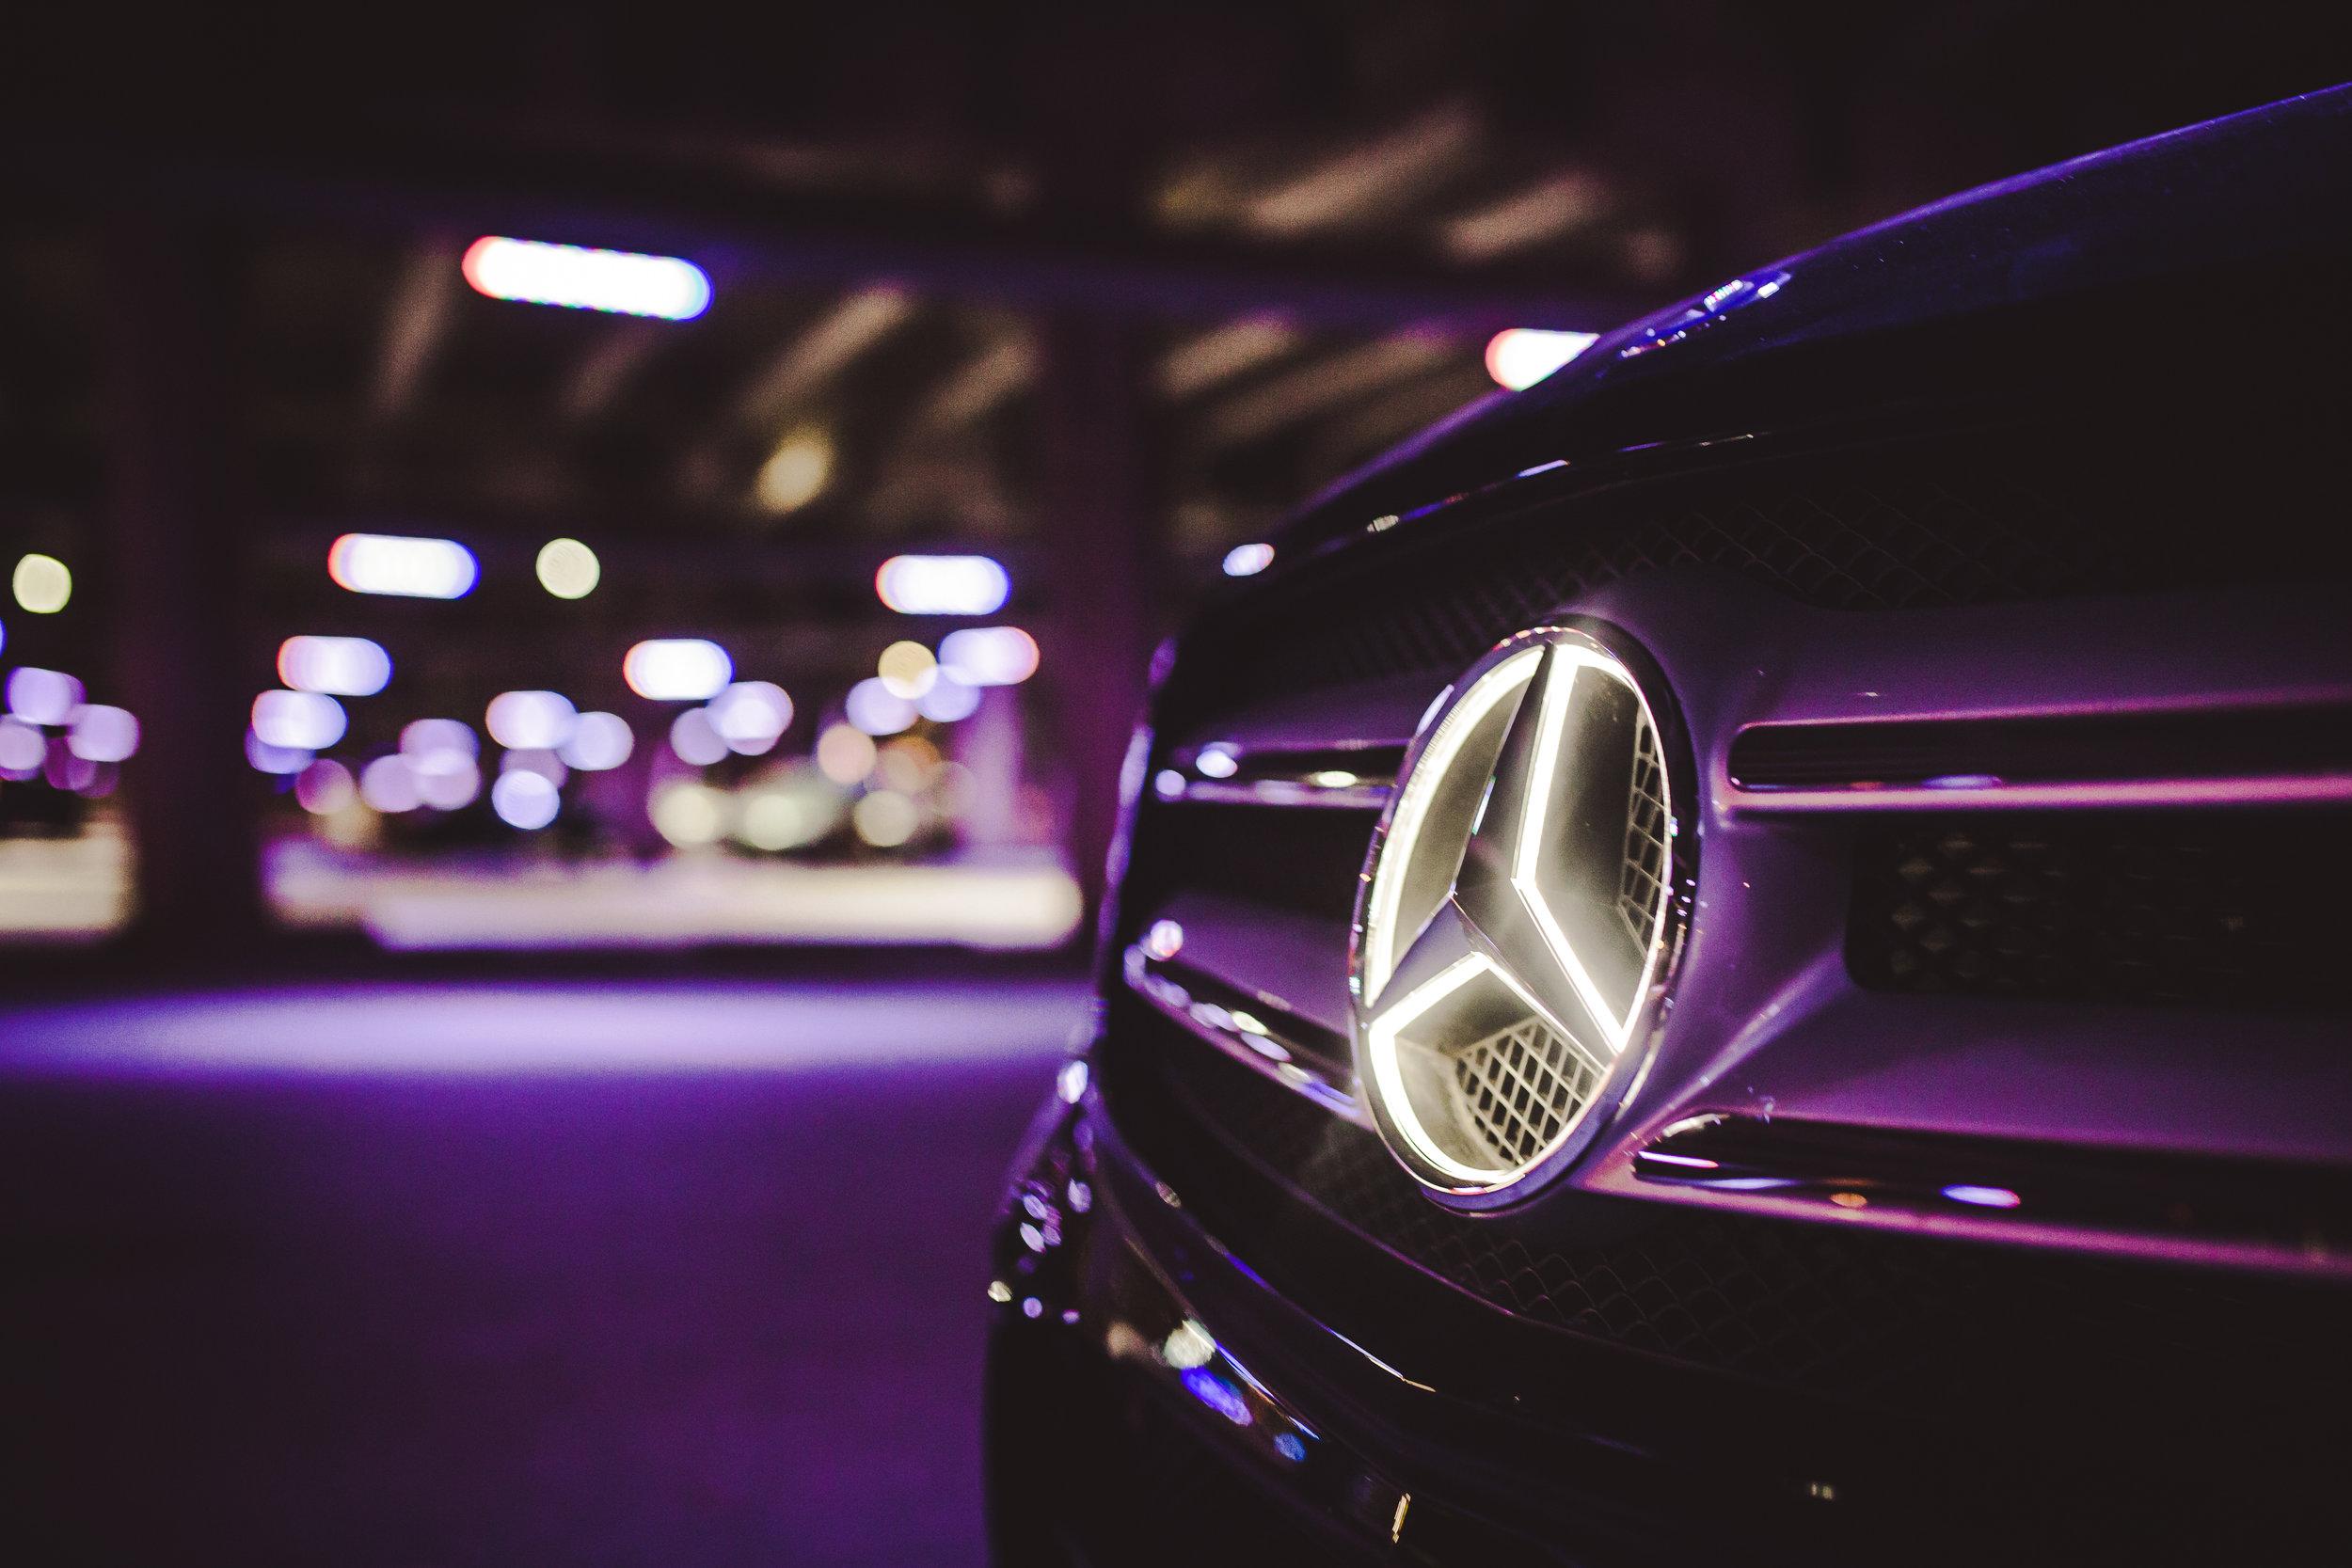 1Mercedes_Benz_GLA250_September 22- 2015_Photo by Drew DeGennaro (www.naro.photo)_82_-9.jpg